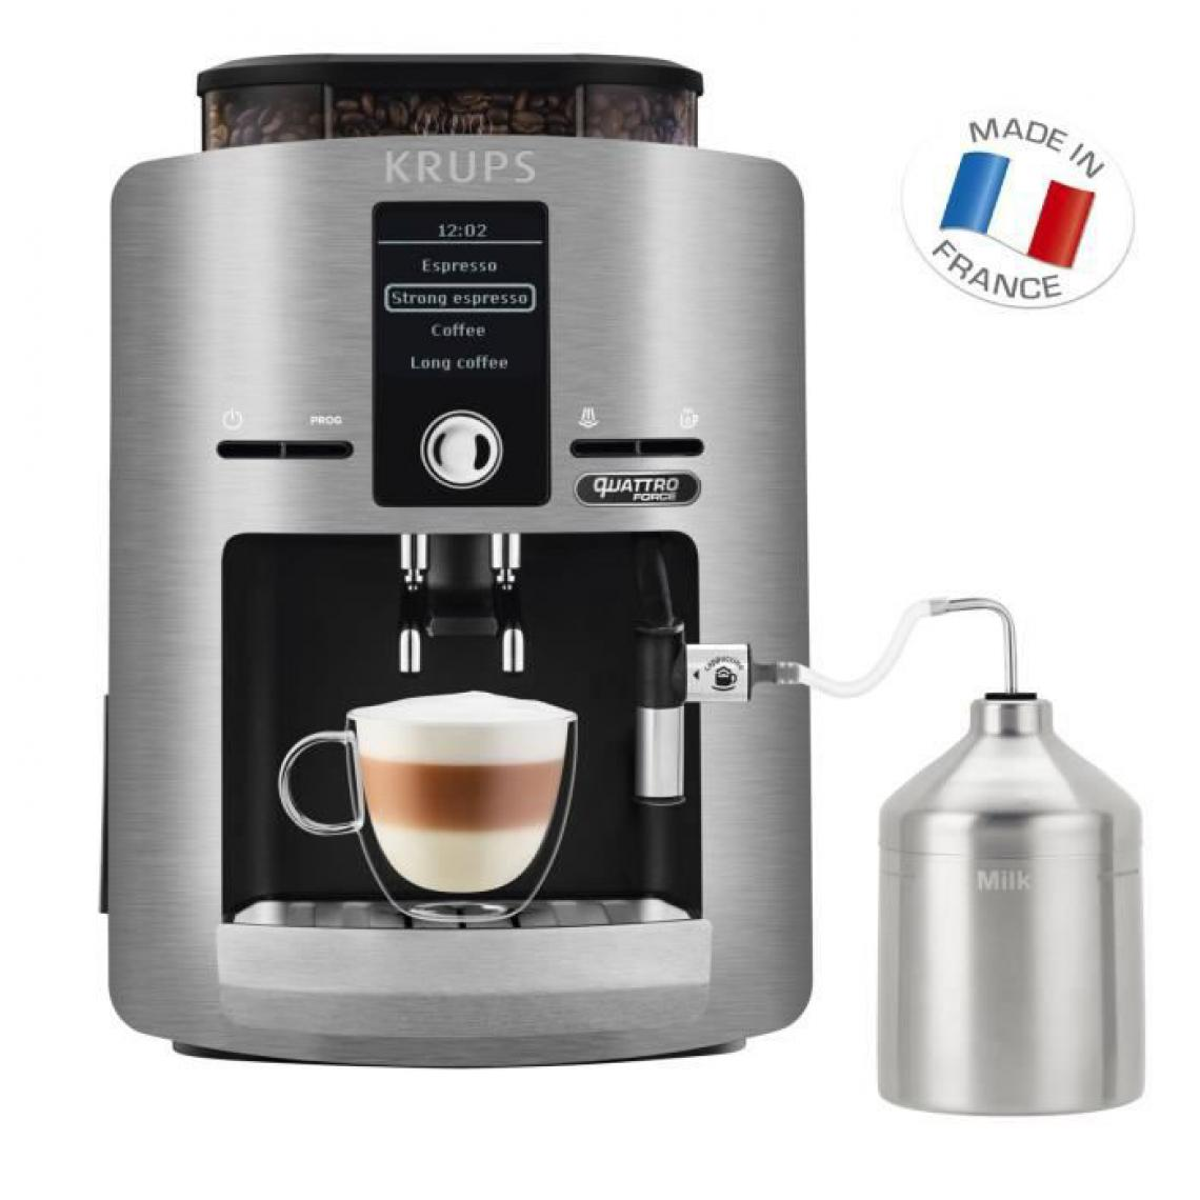 Krups Krups Espresseria Silver Machine a Café Broyeur Grain Ecran LCD Quattro Force Cafetiere Expresso Cappuccinos YY3069FD